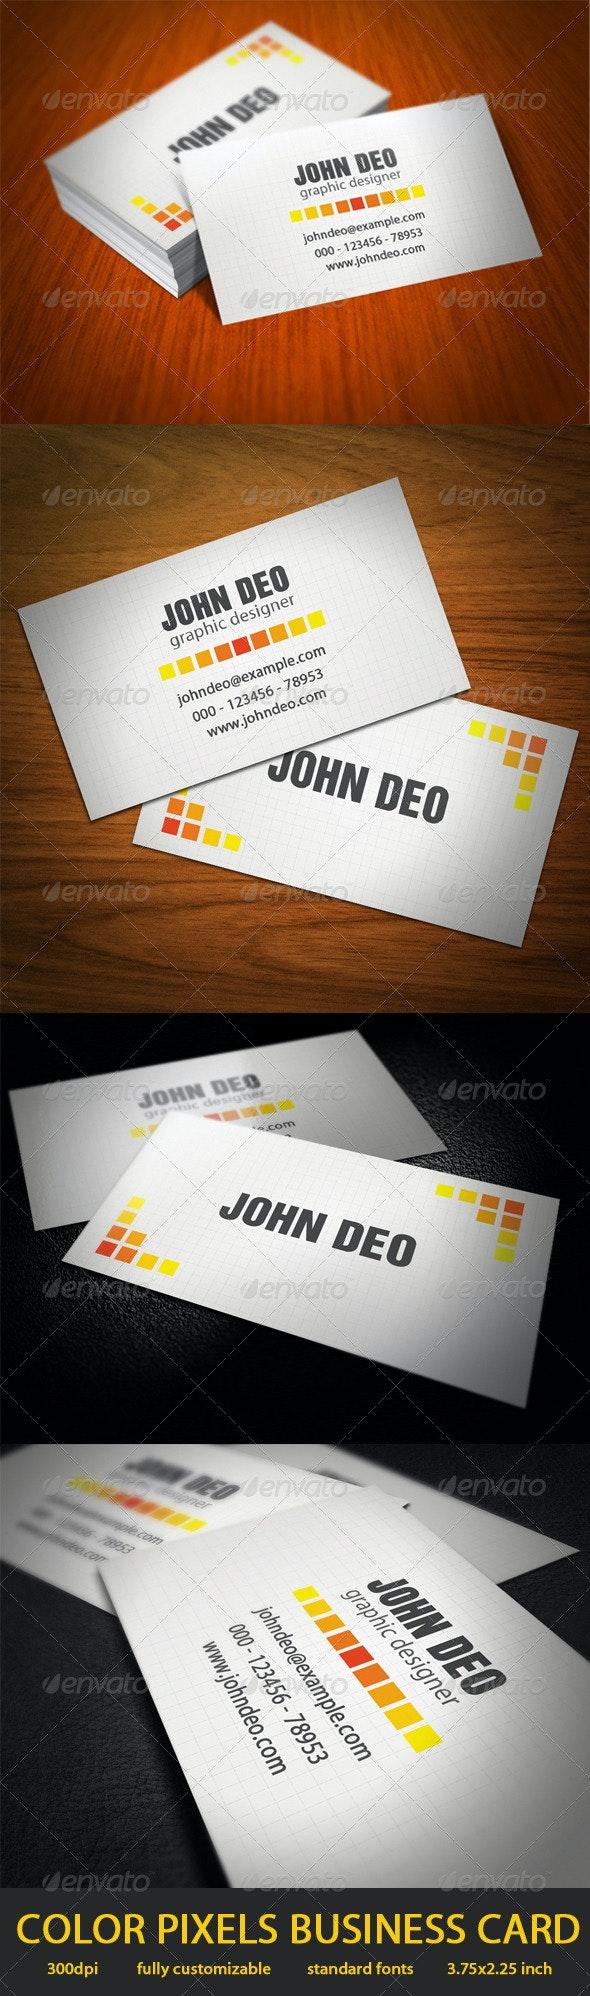 Color Pixels Business Cards - Corporate Business Cards